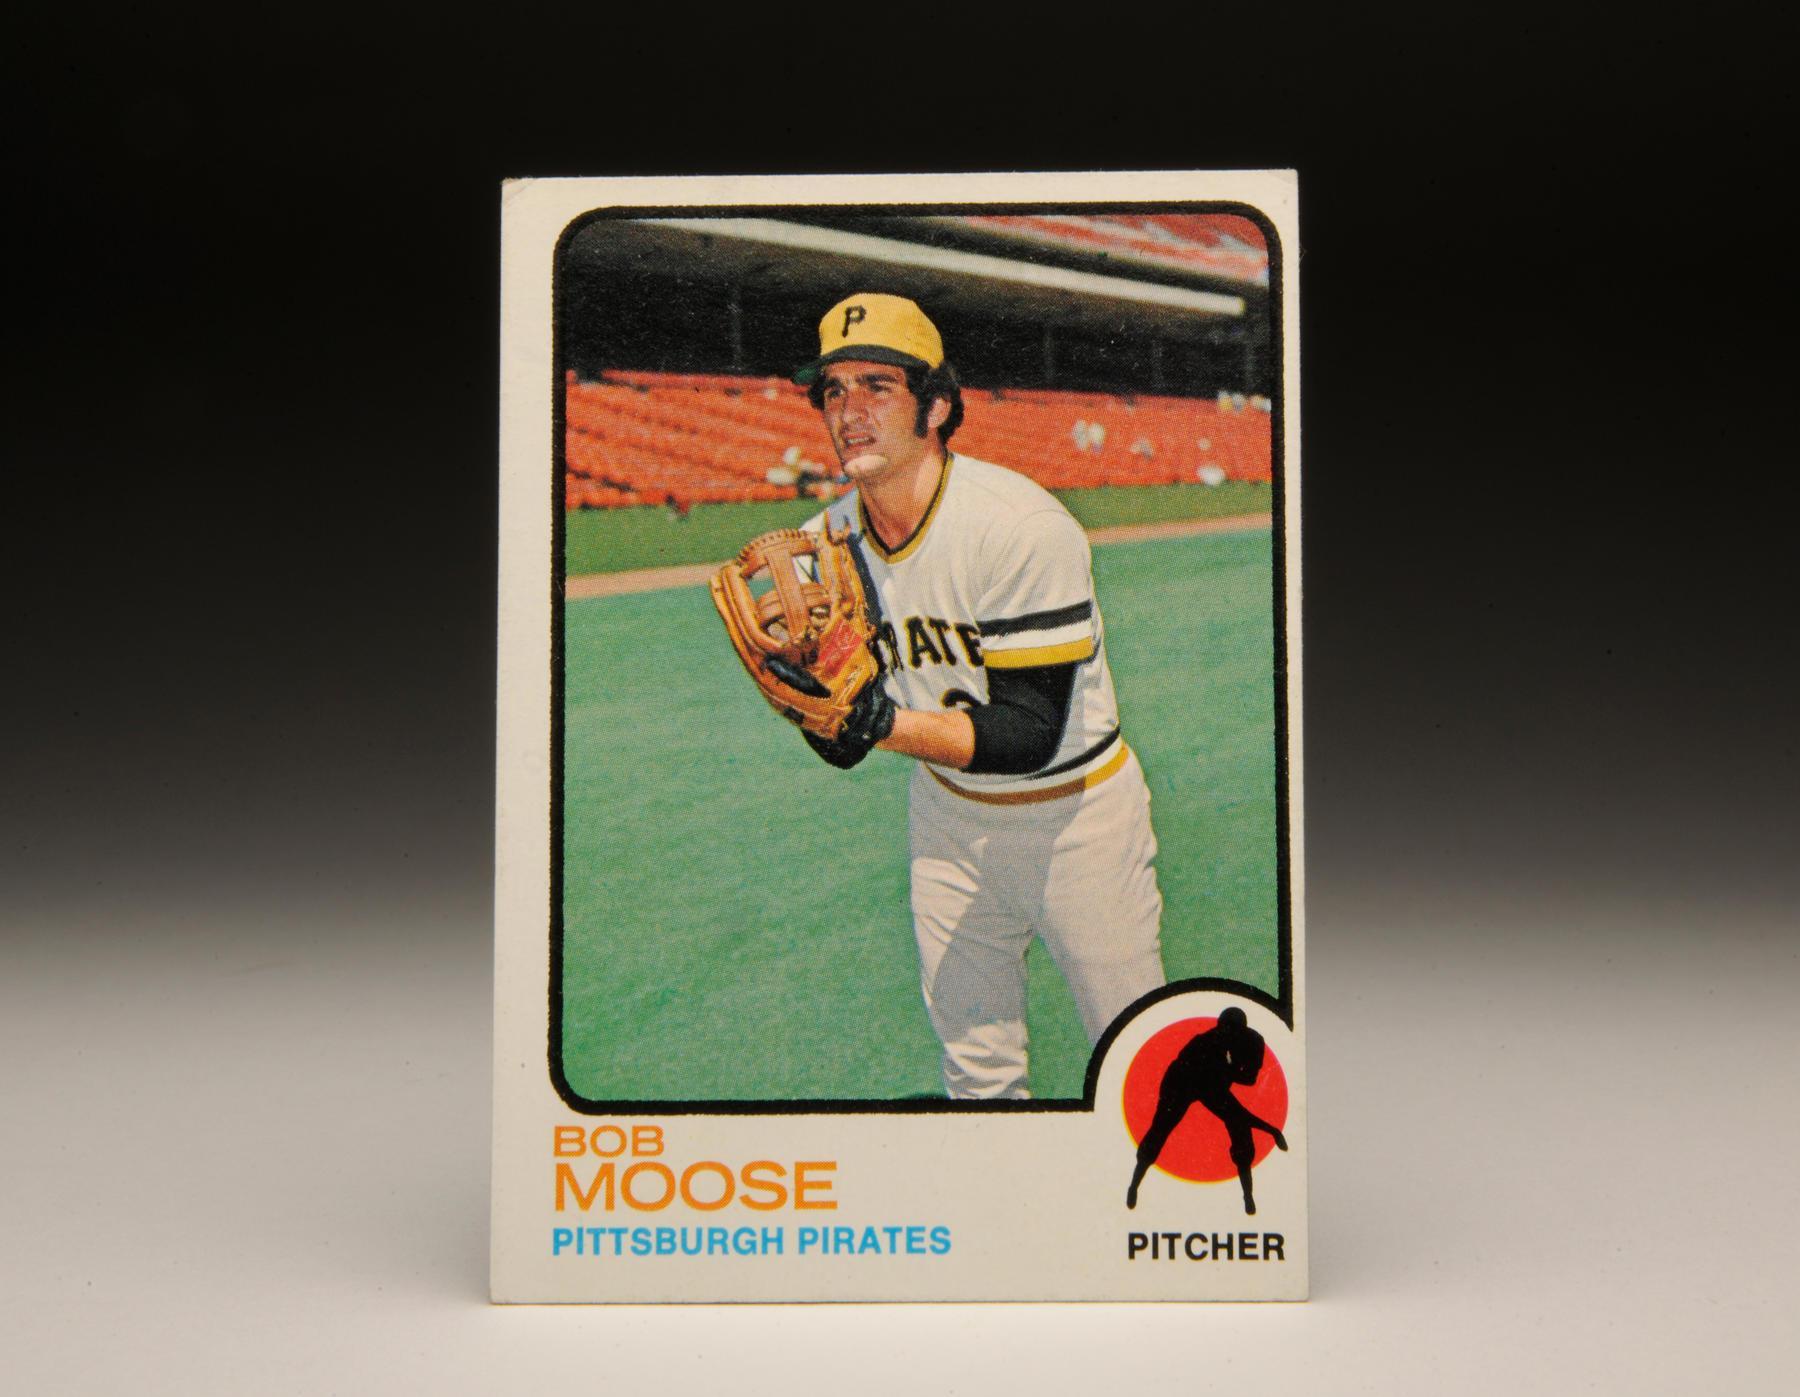 1973 Bob Moose Topps card. (Milo Stewart, Jr. / National Baseball Hall of Fame)